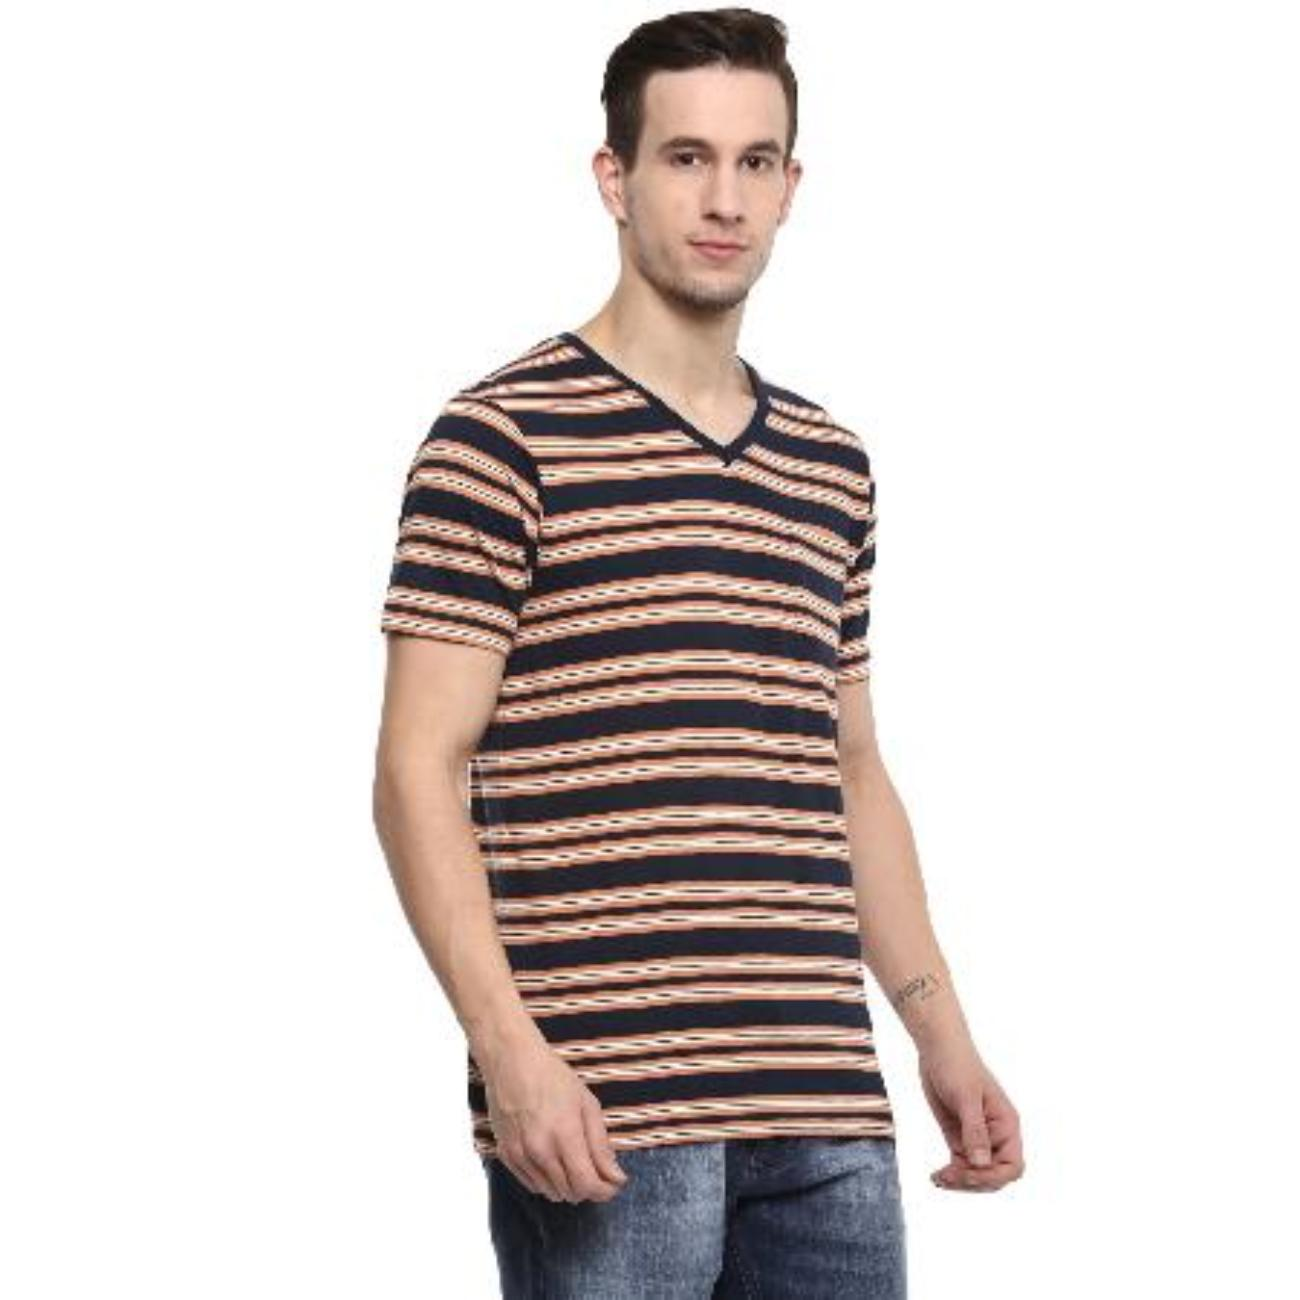 Casual Wear TShirts for Men